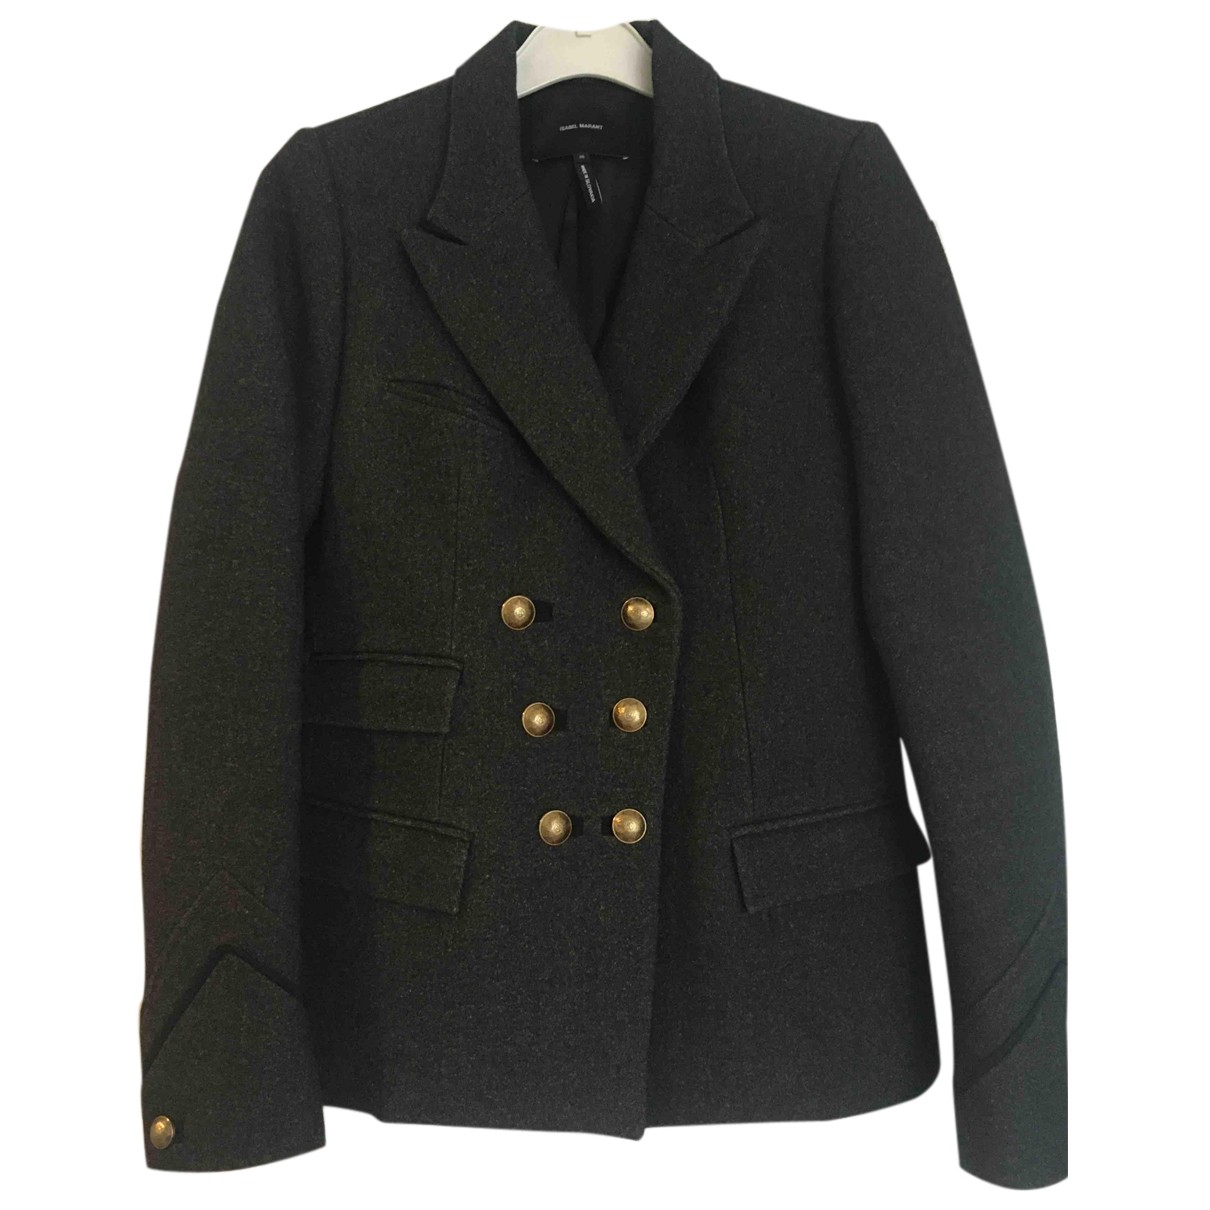 Isabel Marant N Anthracite Wool jacket for Women 36 FR